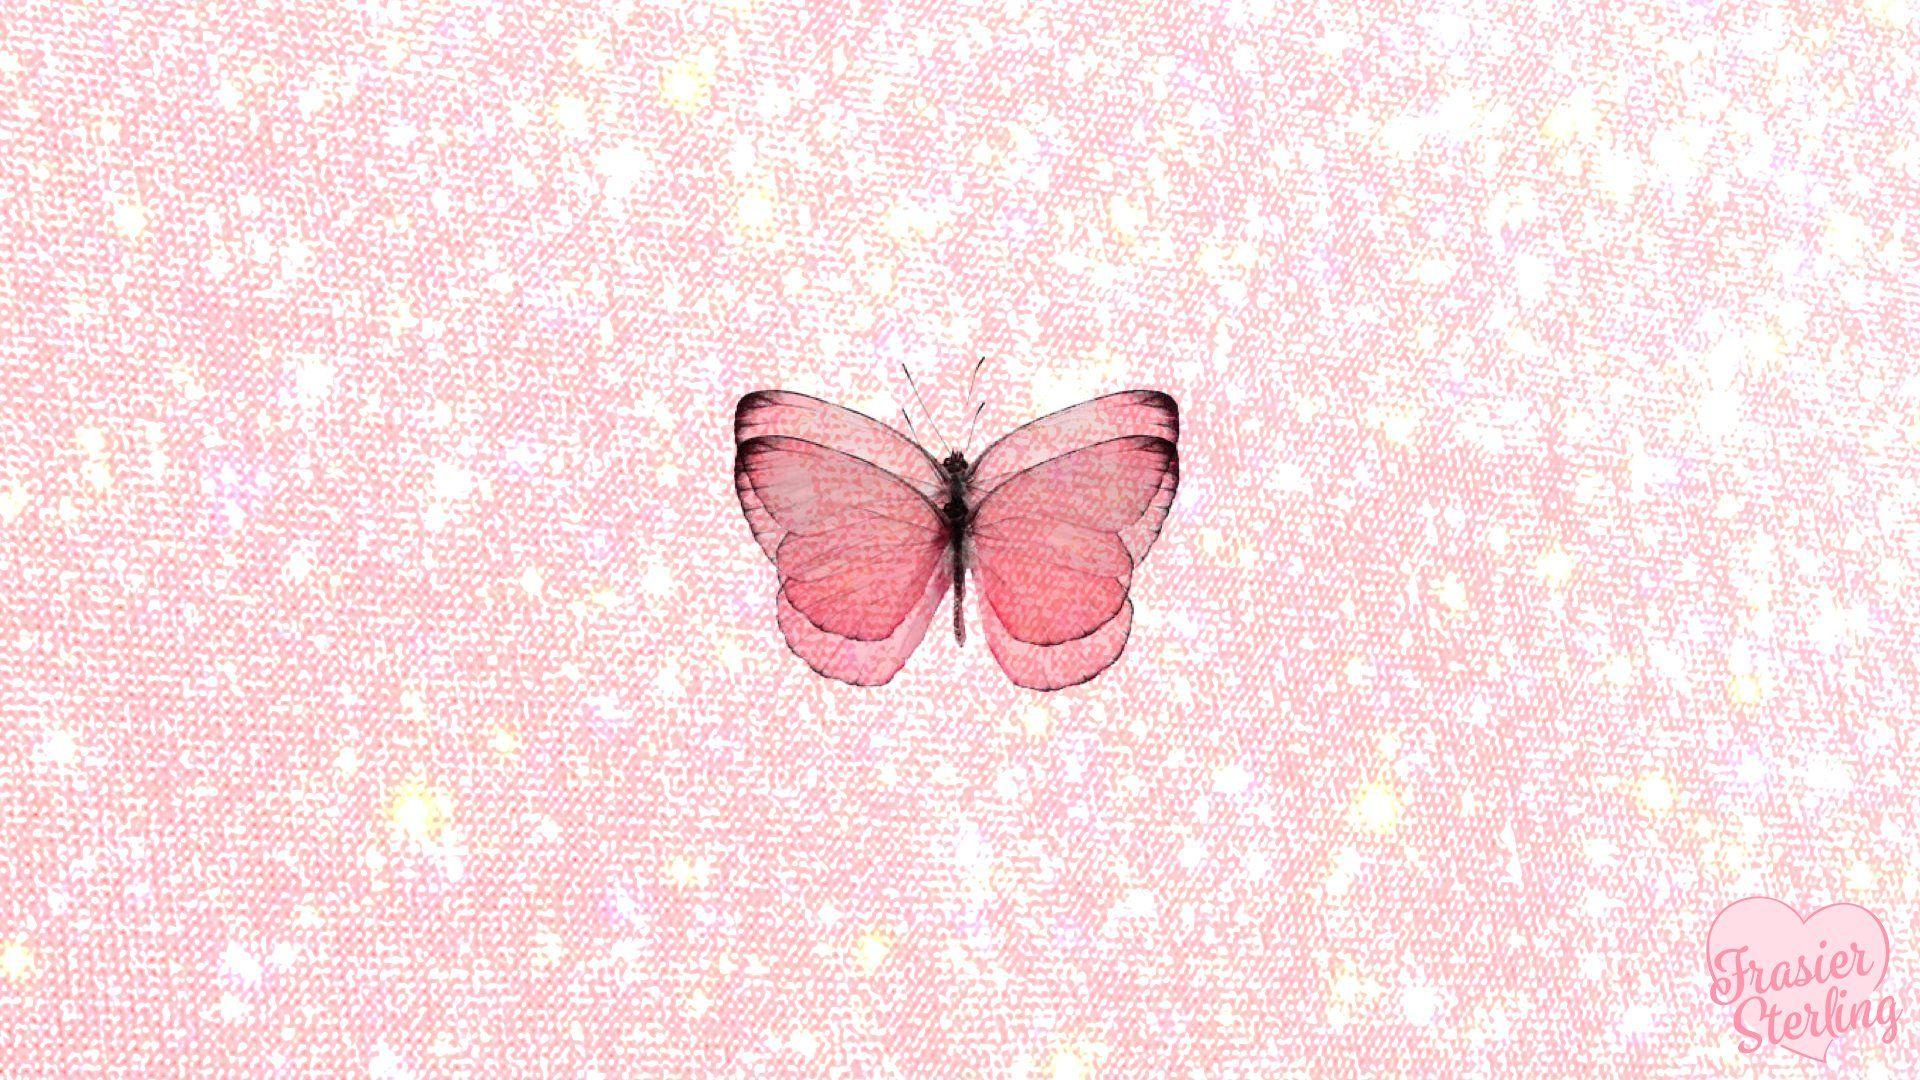 Pink Butterfly Aesthetic Laptop Wallpaper Novocom Top Butterfly on orange flower wallpaper. pink butterfly aesthetic laptop